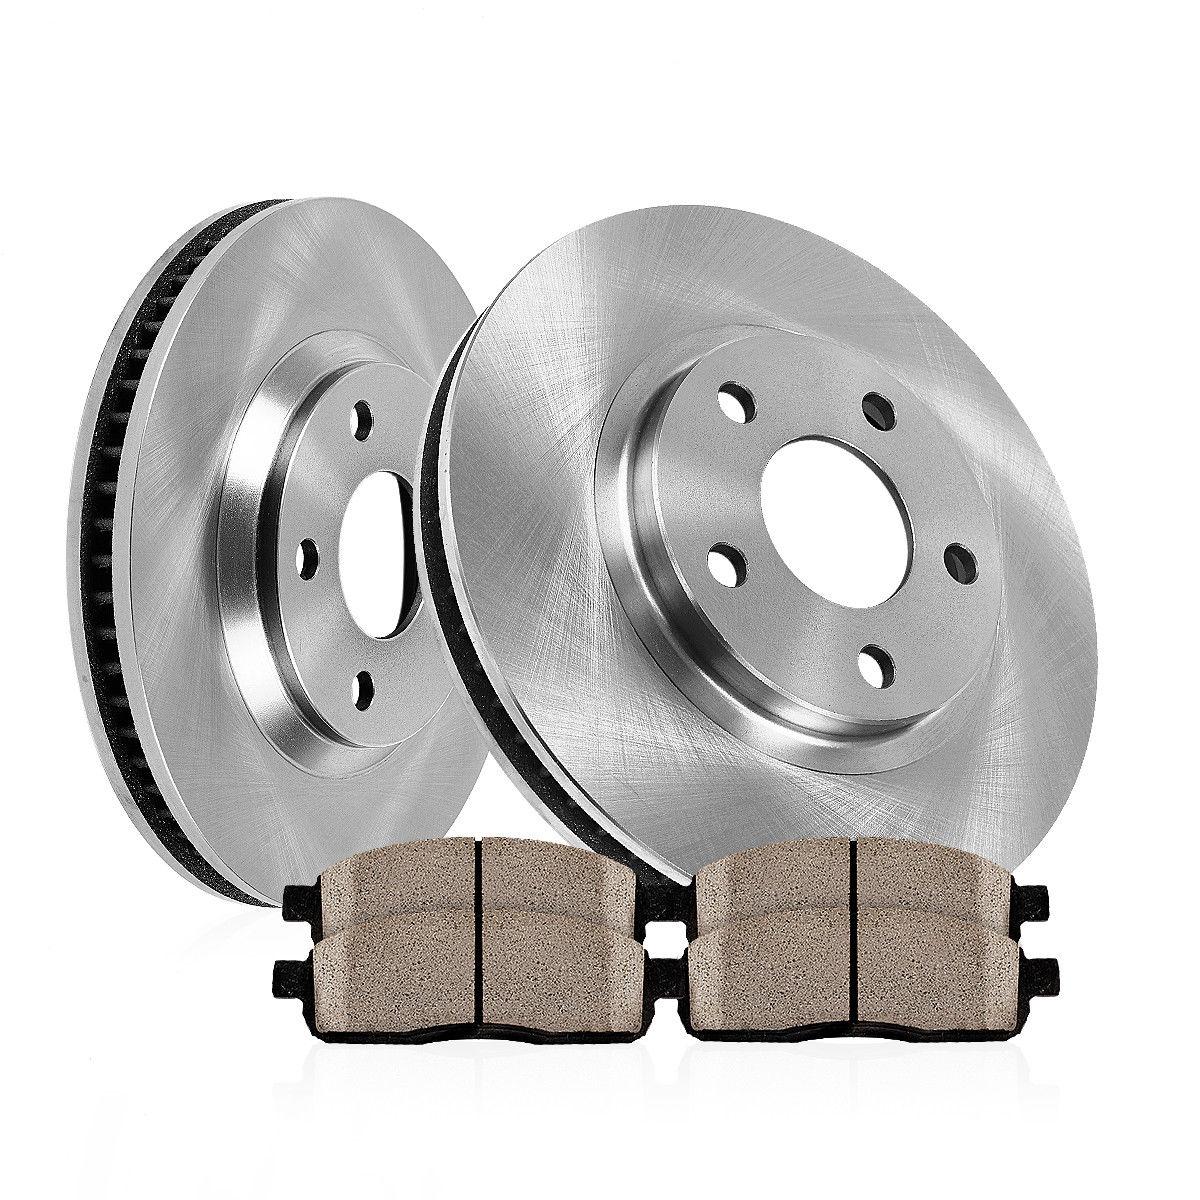 Rear Brake Rotors Ceramic Pads For HONDA ODYSSEY 2005 2006 2007 2008 2009 2010